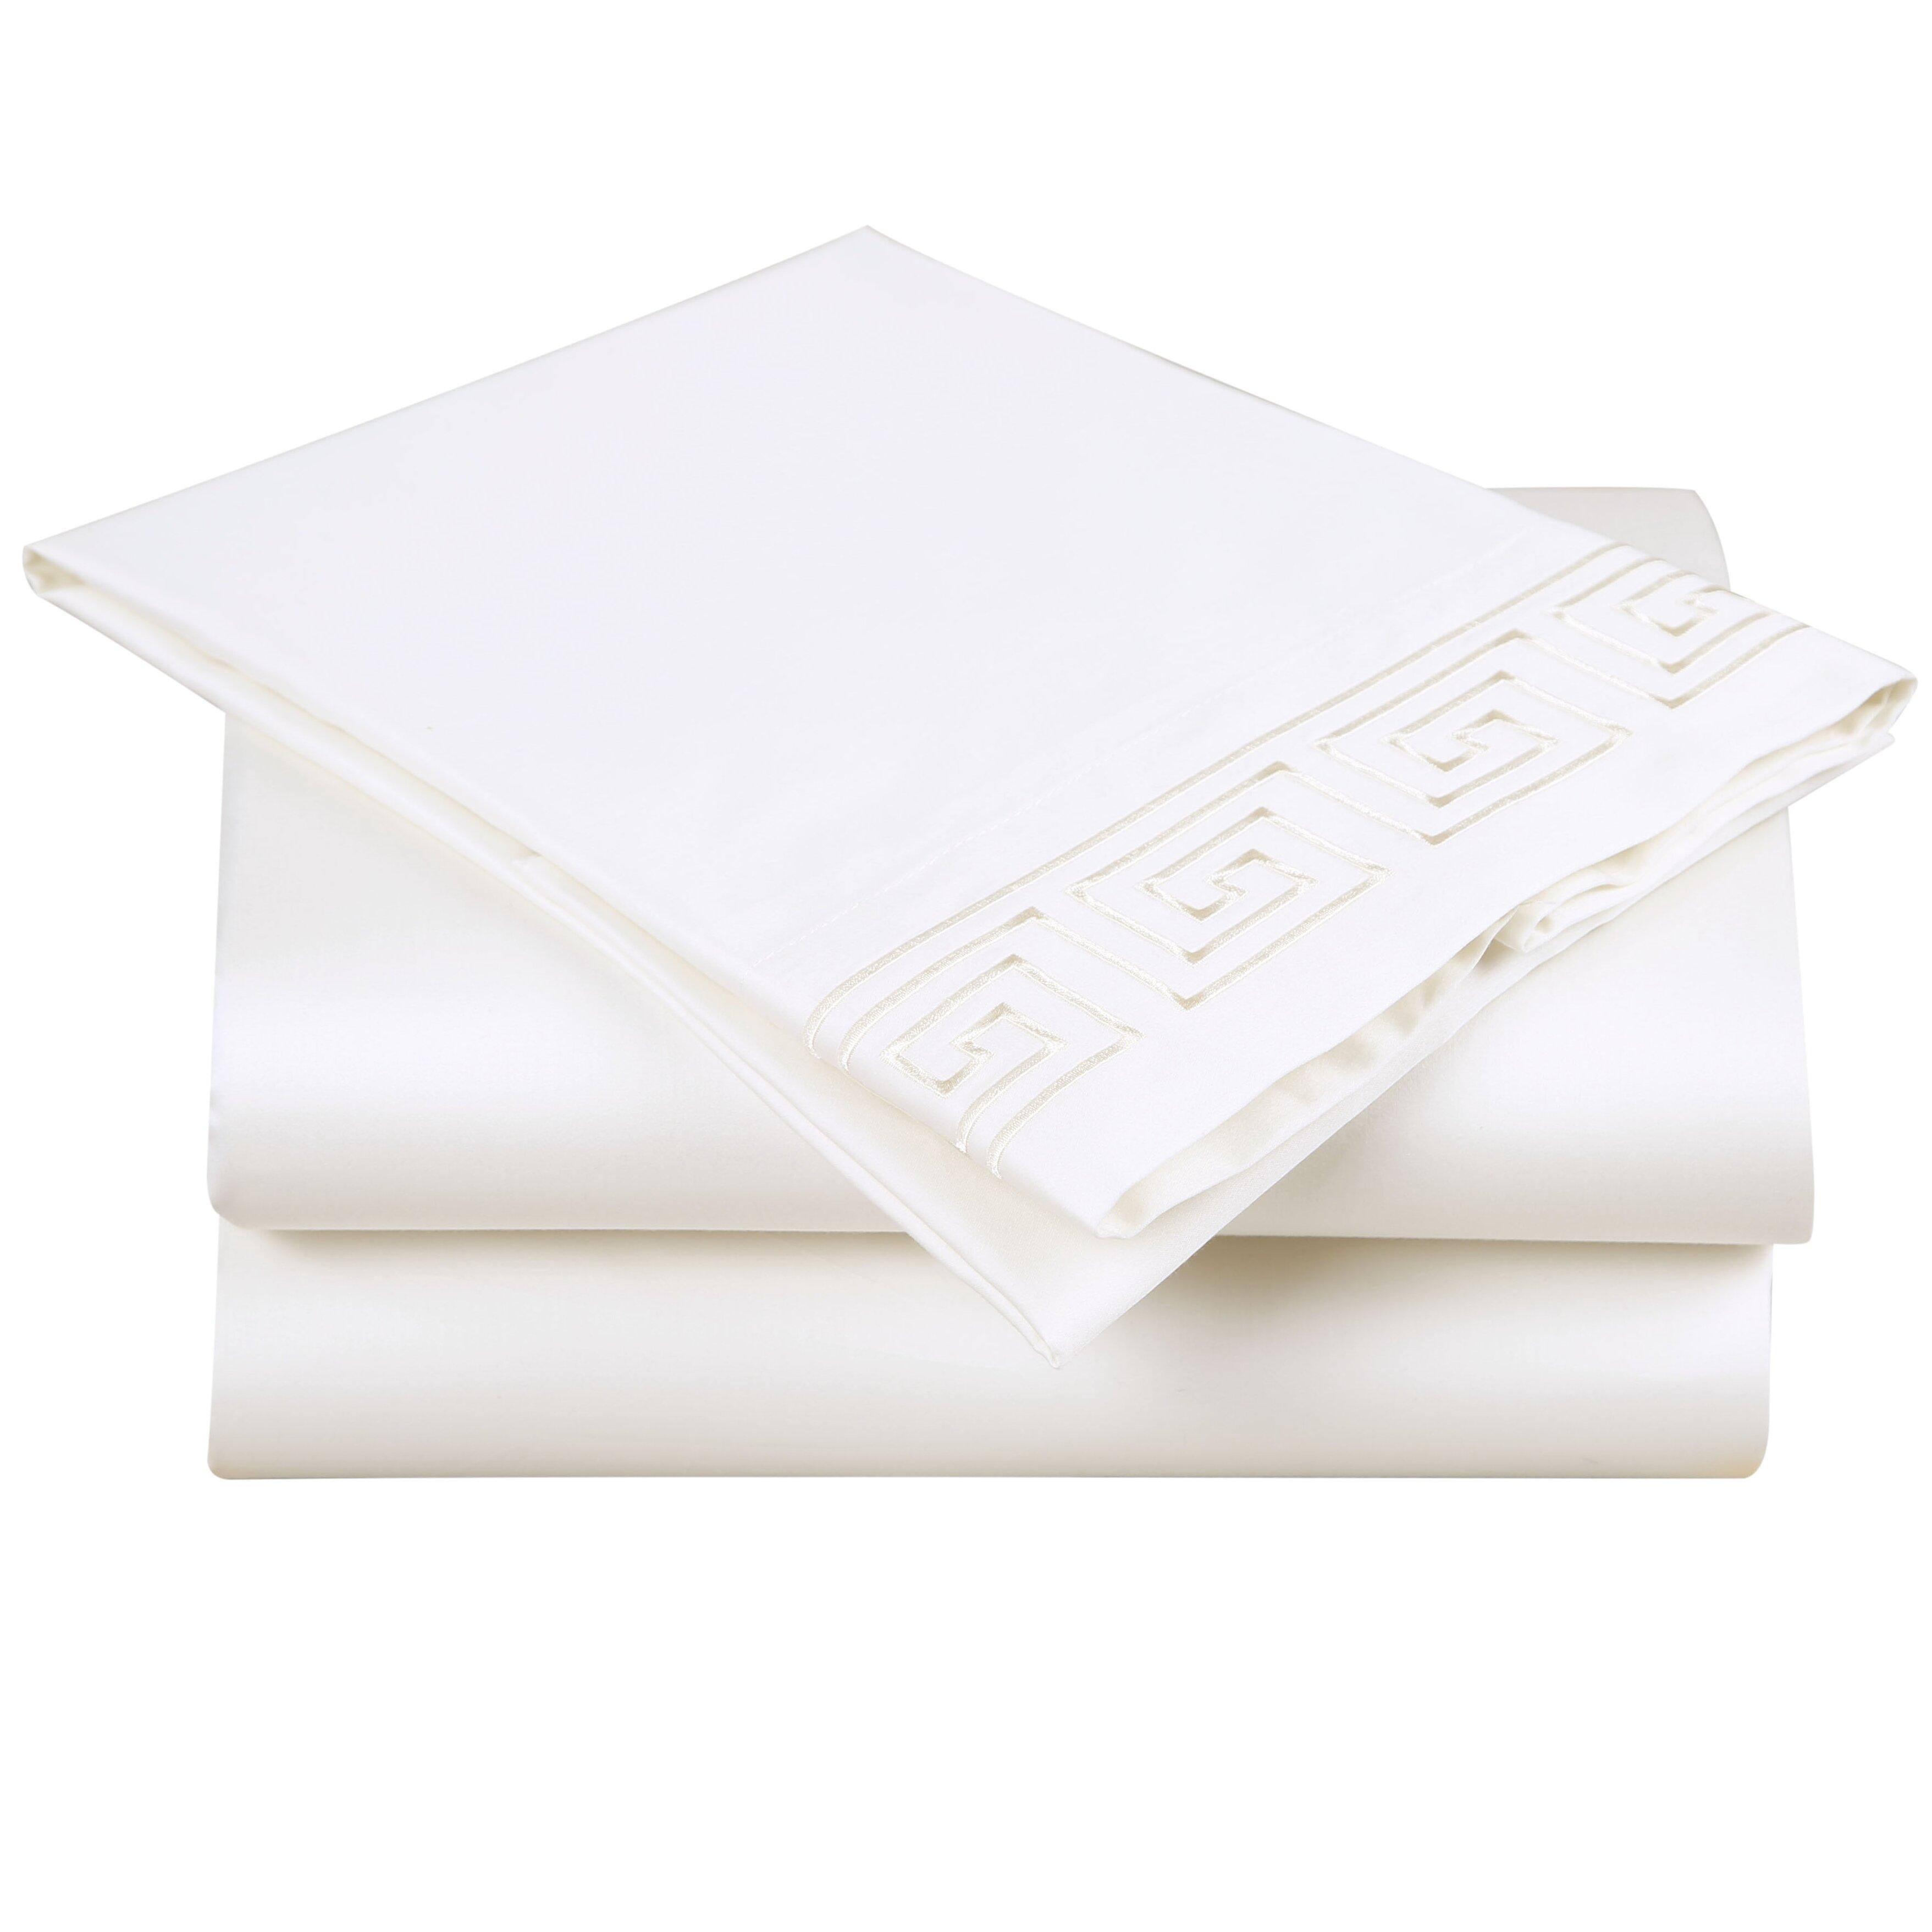 affluence home fashions 600 thread count cotton sheet set reviews wayfair. Black Bedroom Furniture Sets. Home Design Ideas